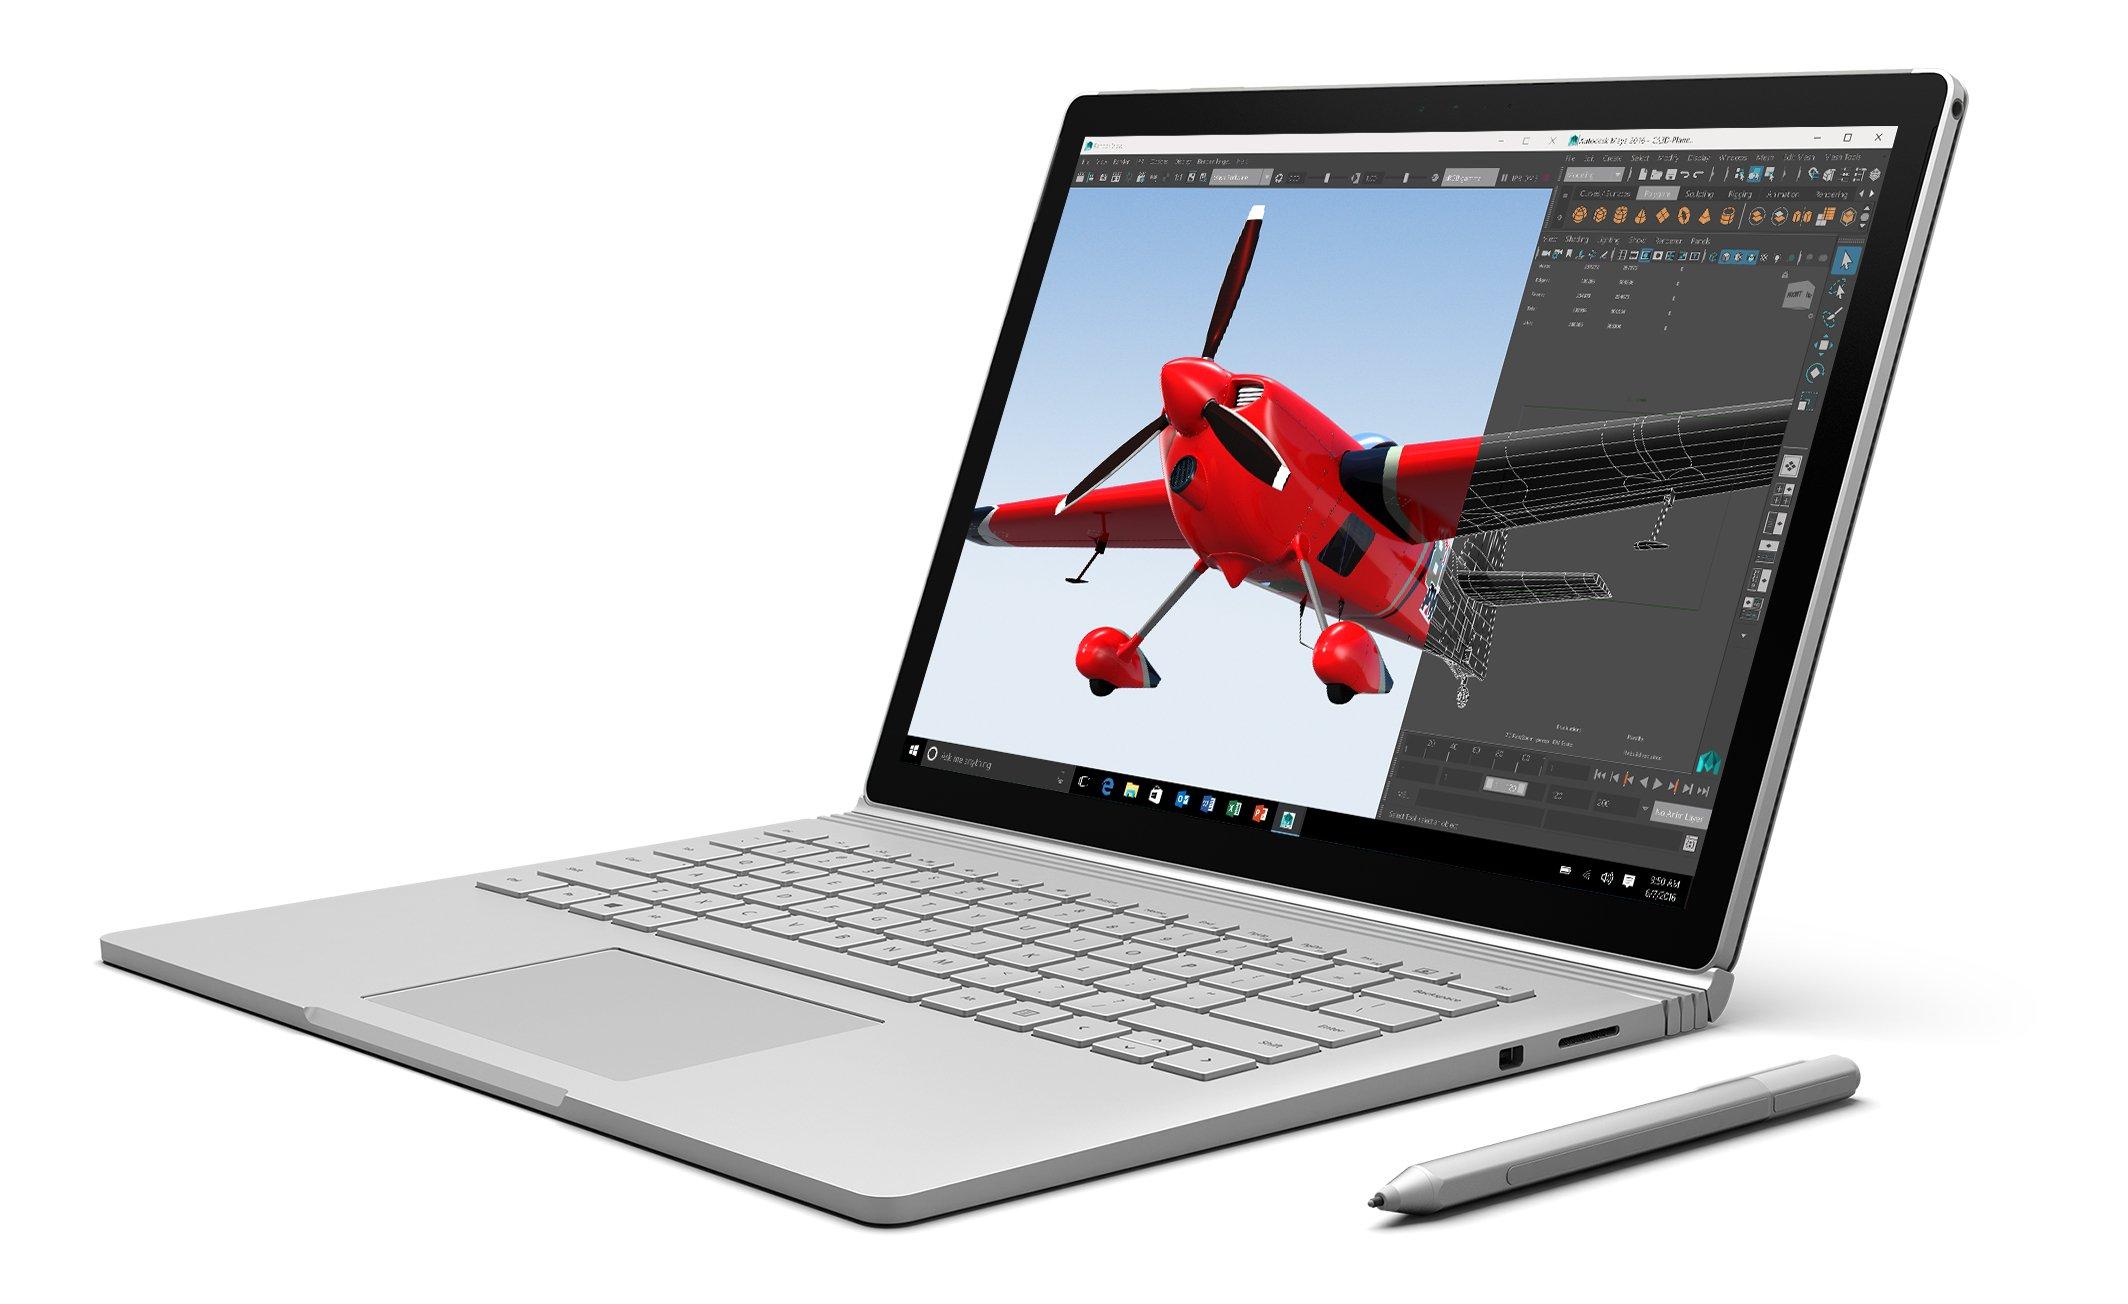 Microsoft Surface Book (128 GB, 8 GB RAM, Intel Core i5) by Microsoft